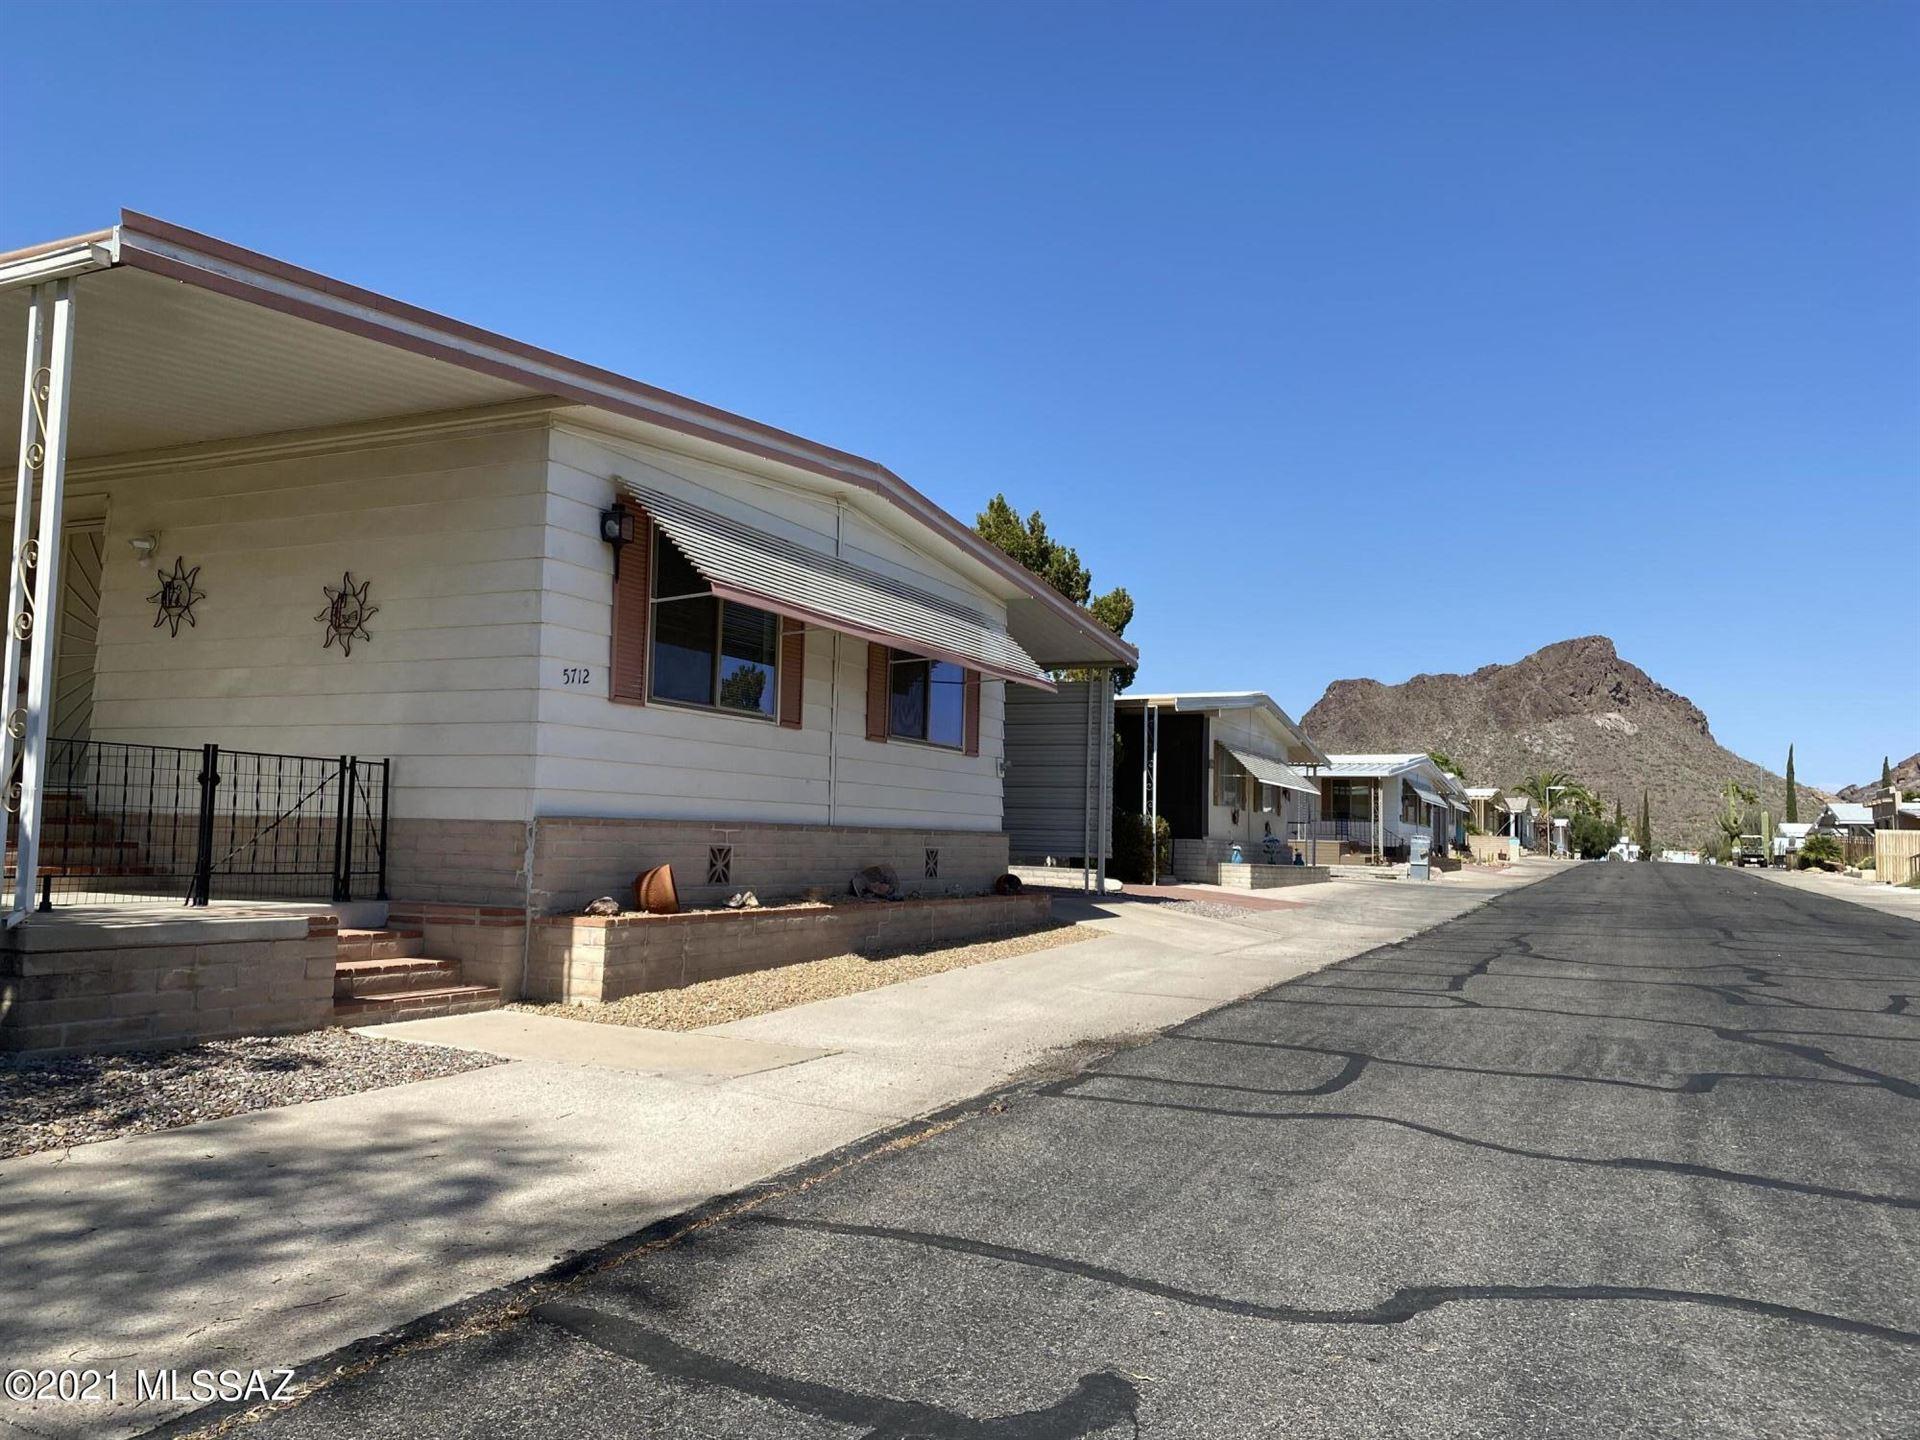 5712 W Diamond K Street, Tucson, AZ 85713 - MLS#: 22115307